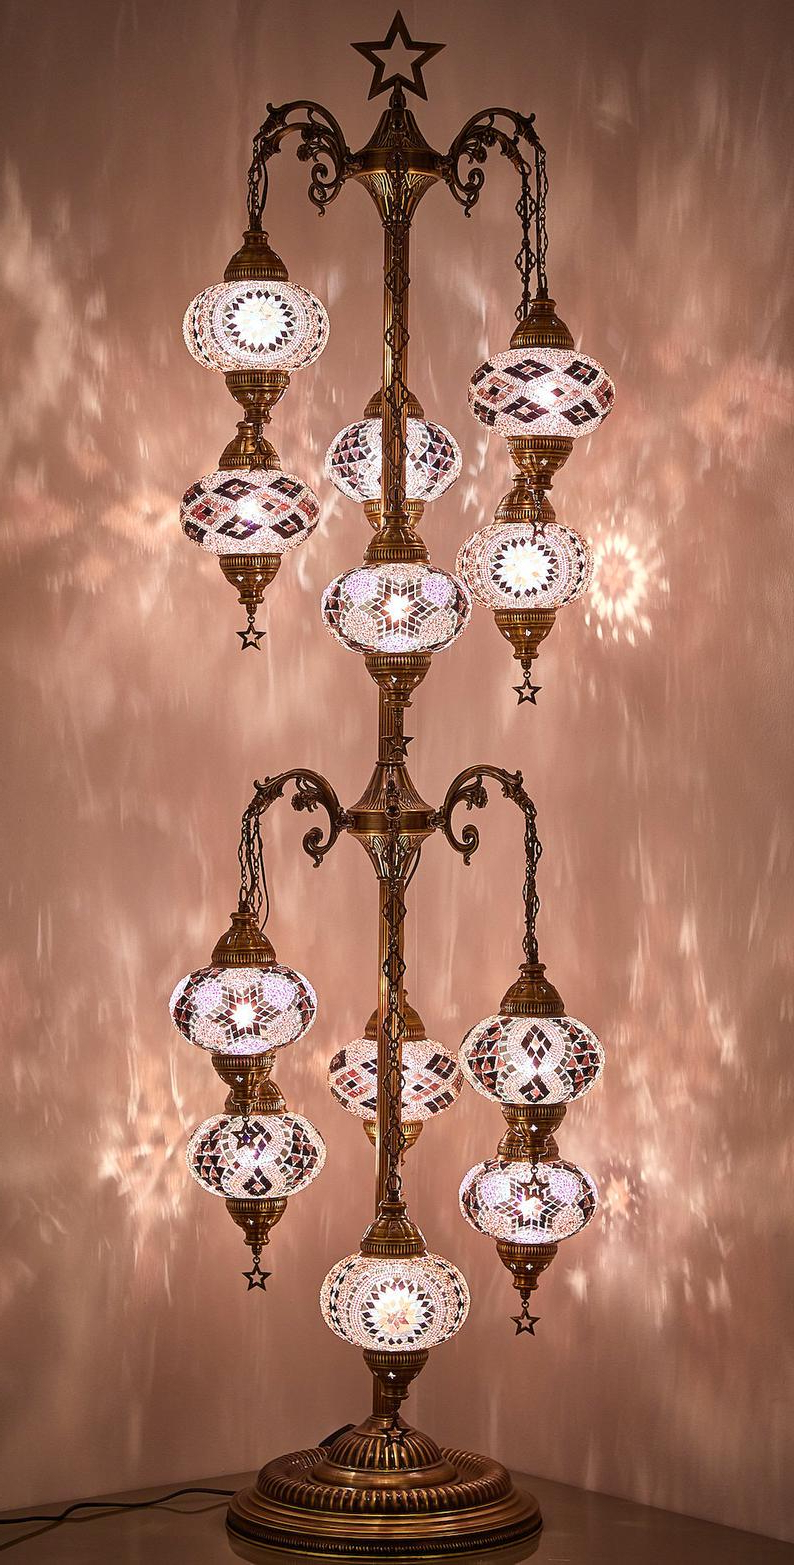 "Fashionable Demmex 12 Big Globes Mosaic Turkish Moroccan Christmas Tree Bohemian  Tiffany Floor Lamp Light, Us Plug & Socket, 68"" Pertaining To Donna 4 Light Globe Chandeliers (View 14 of 25)"